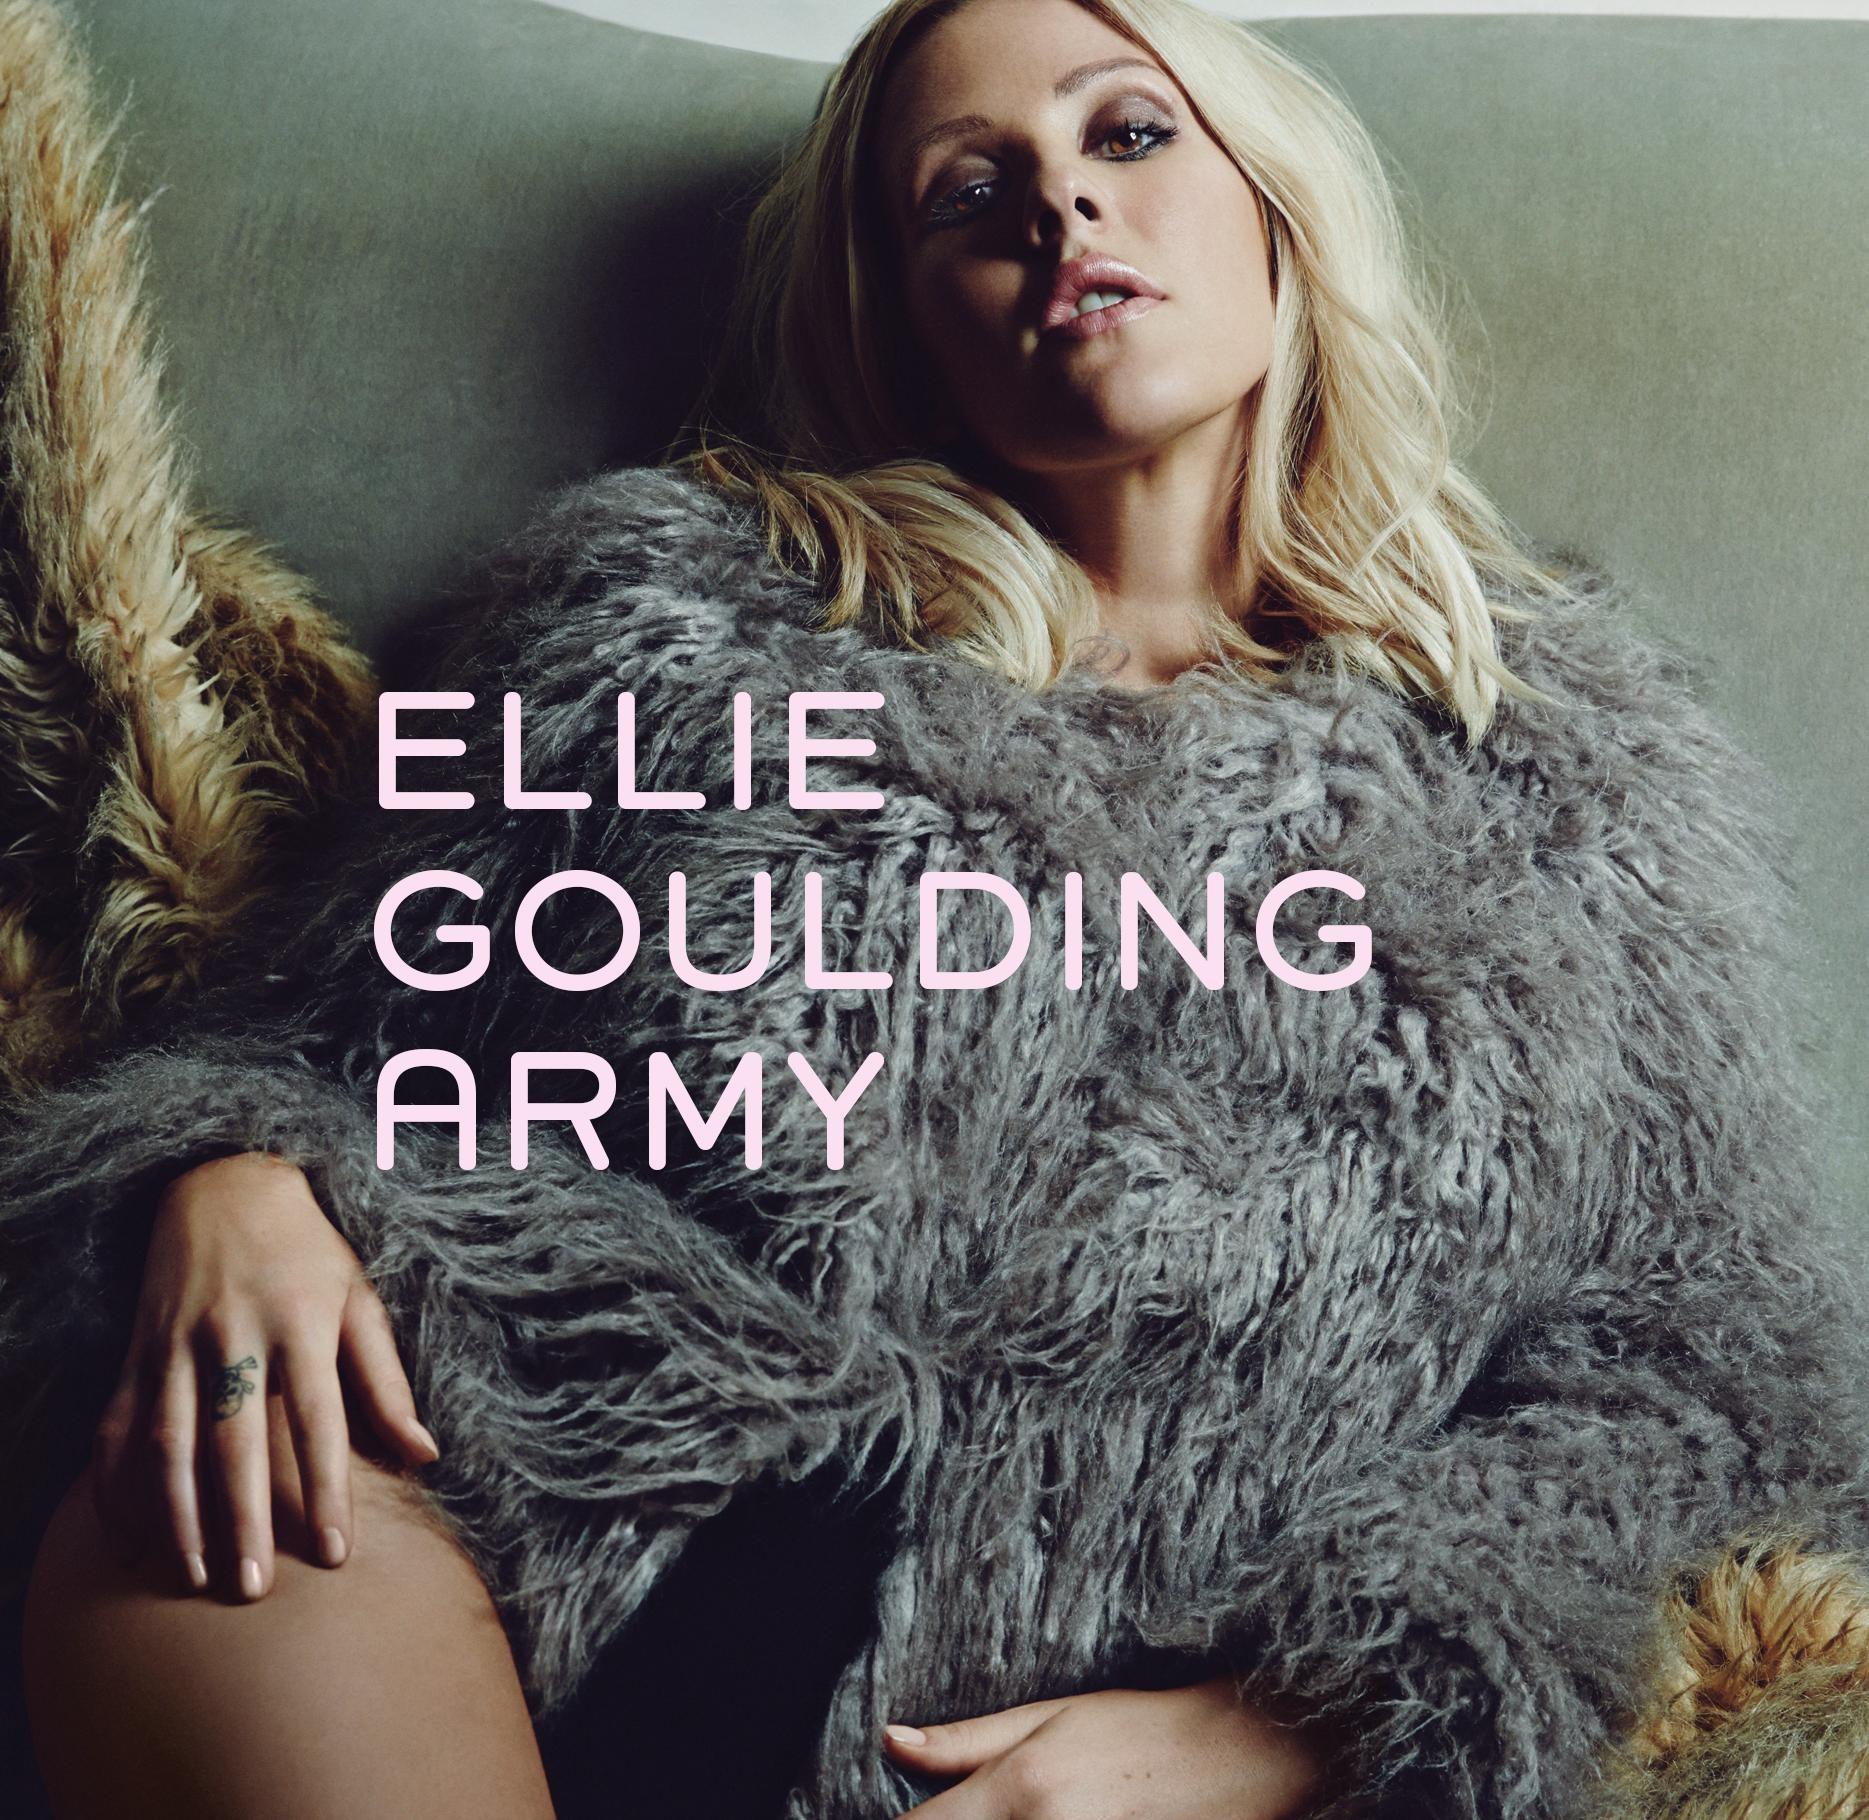 Ellie Goulding – Army (single cover art)